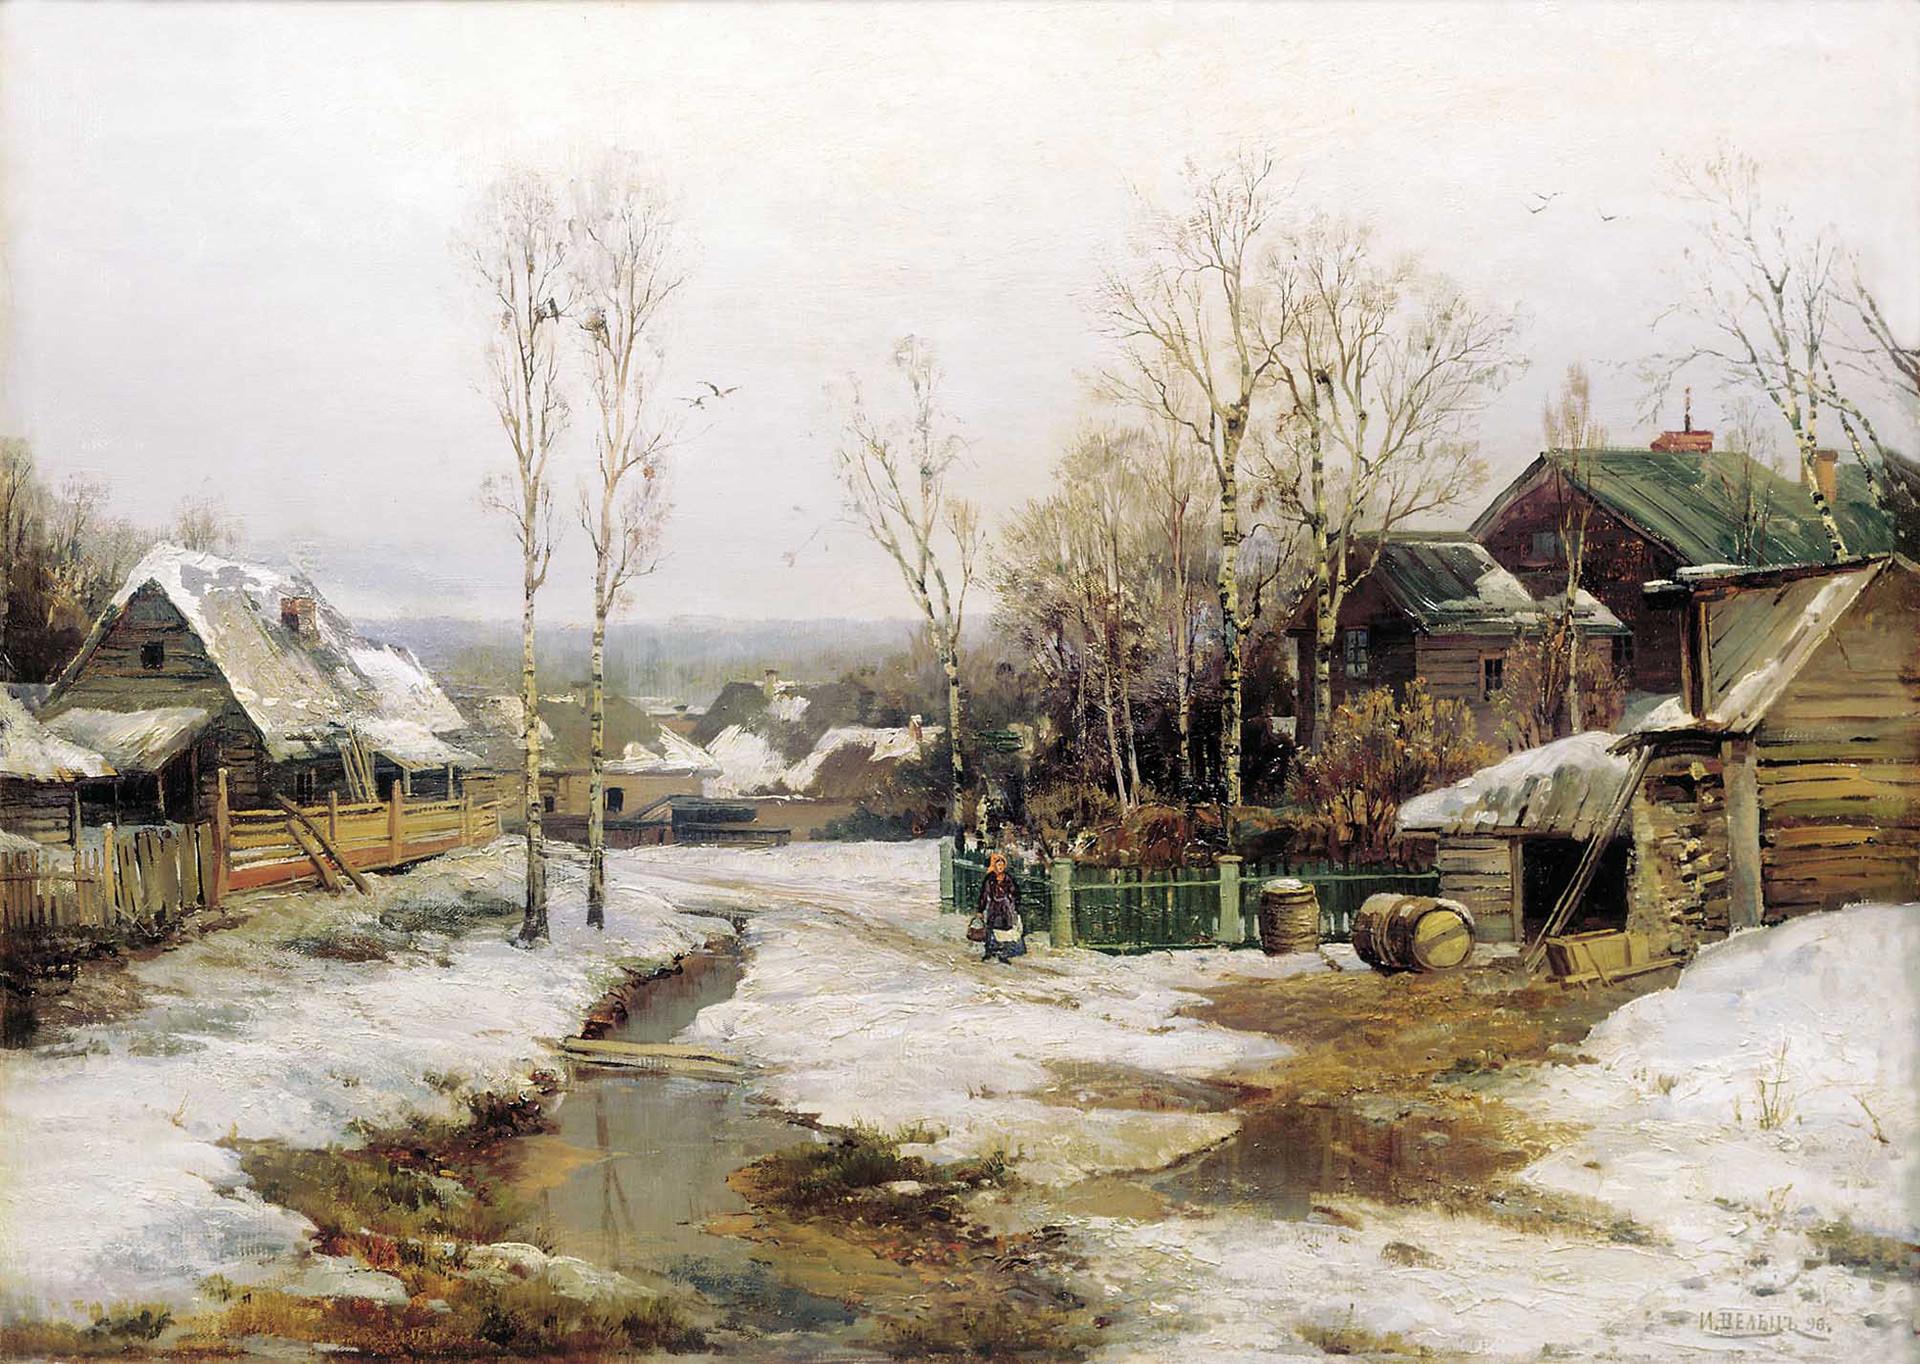 Spring in the Vicinity of St. Petersburg, 1896, Ivan Welz